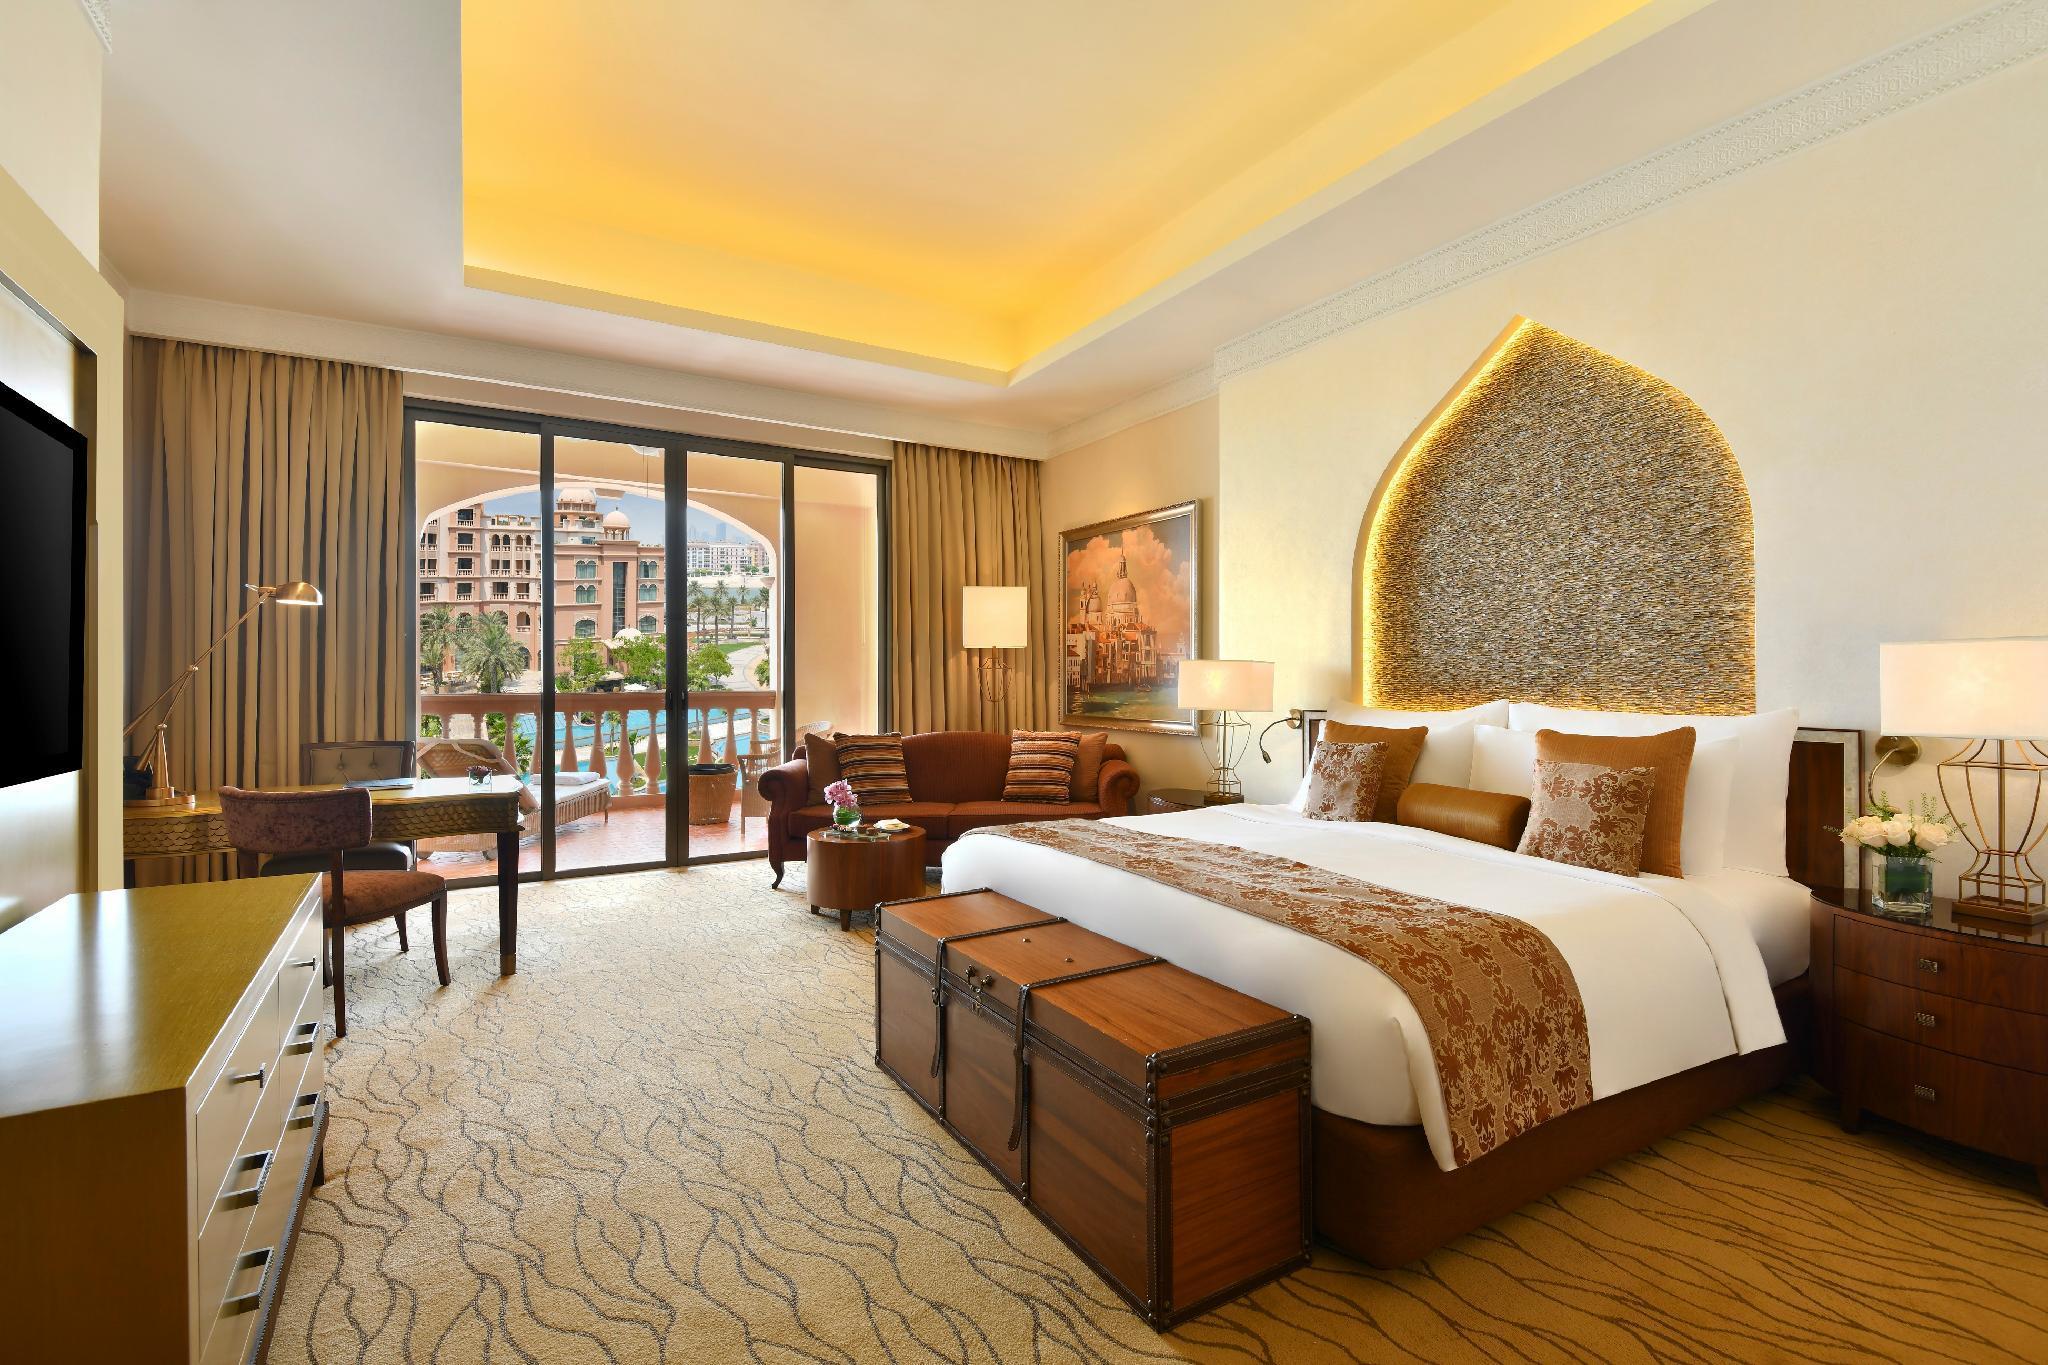 Marsa Malaz Kempinski The Pearl Doha Hotel - Deals, Photos & Reviews